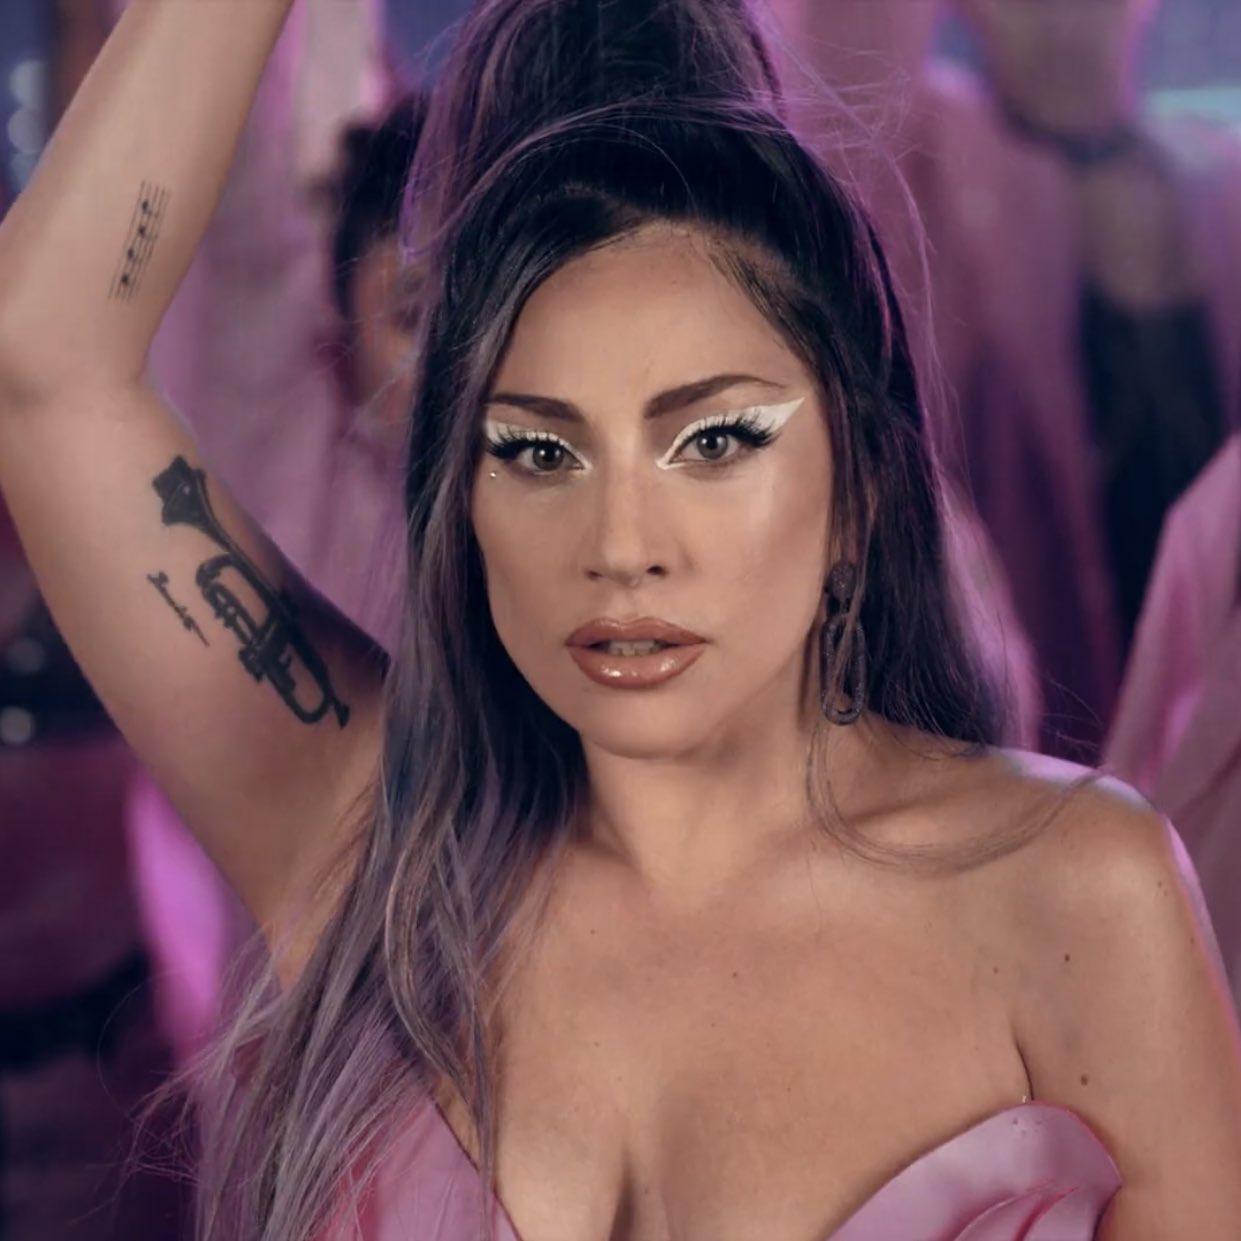 Lady Gaga*Rain on me*❤️🌺